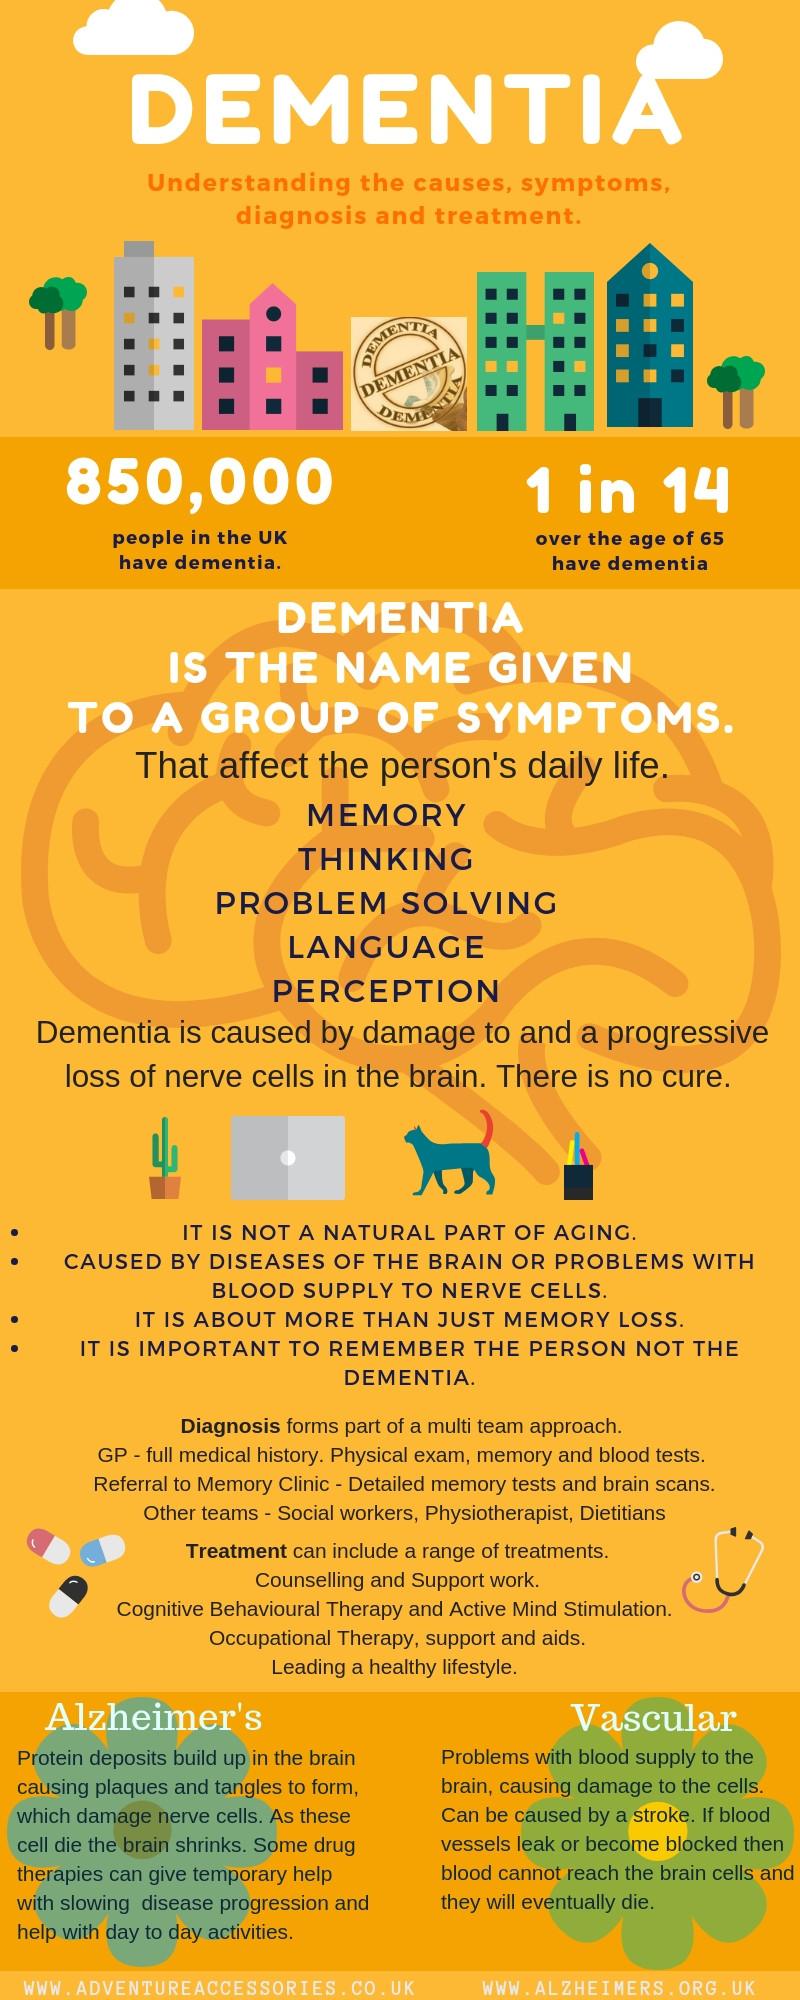 Dementia - causes, symptoms, diagnosis and treatment. Adventure Accessories